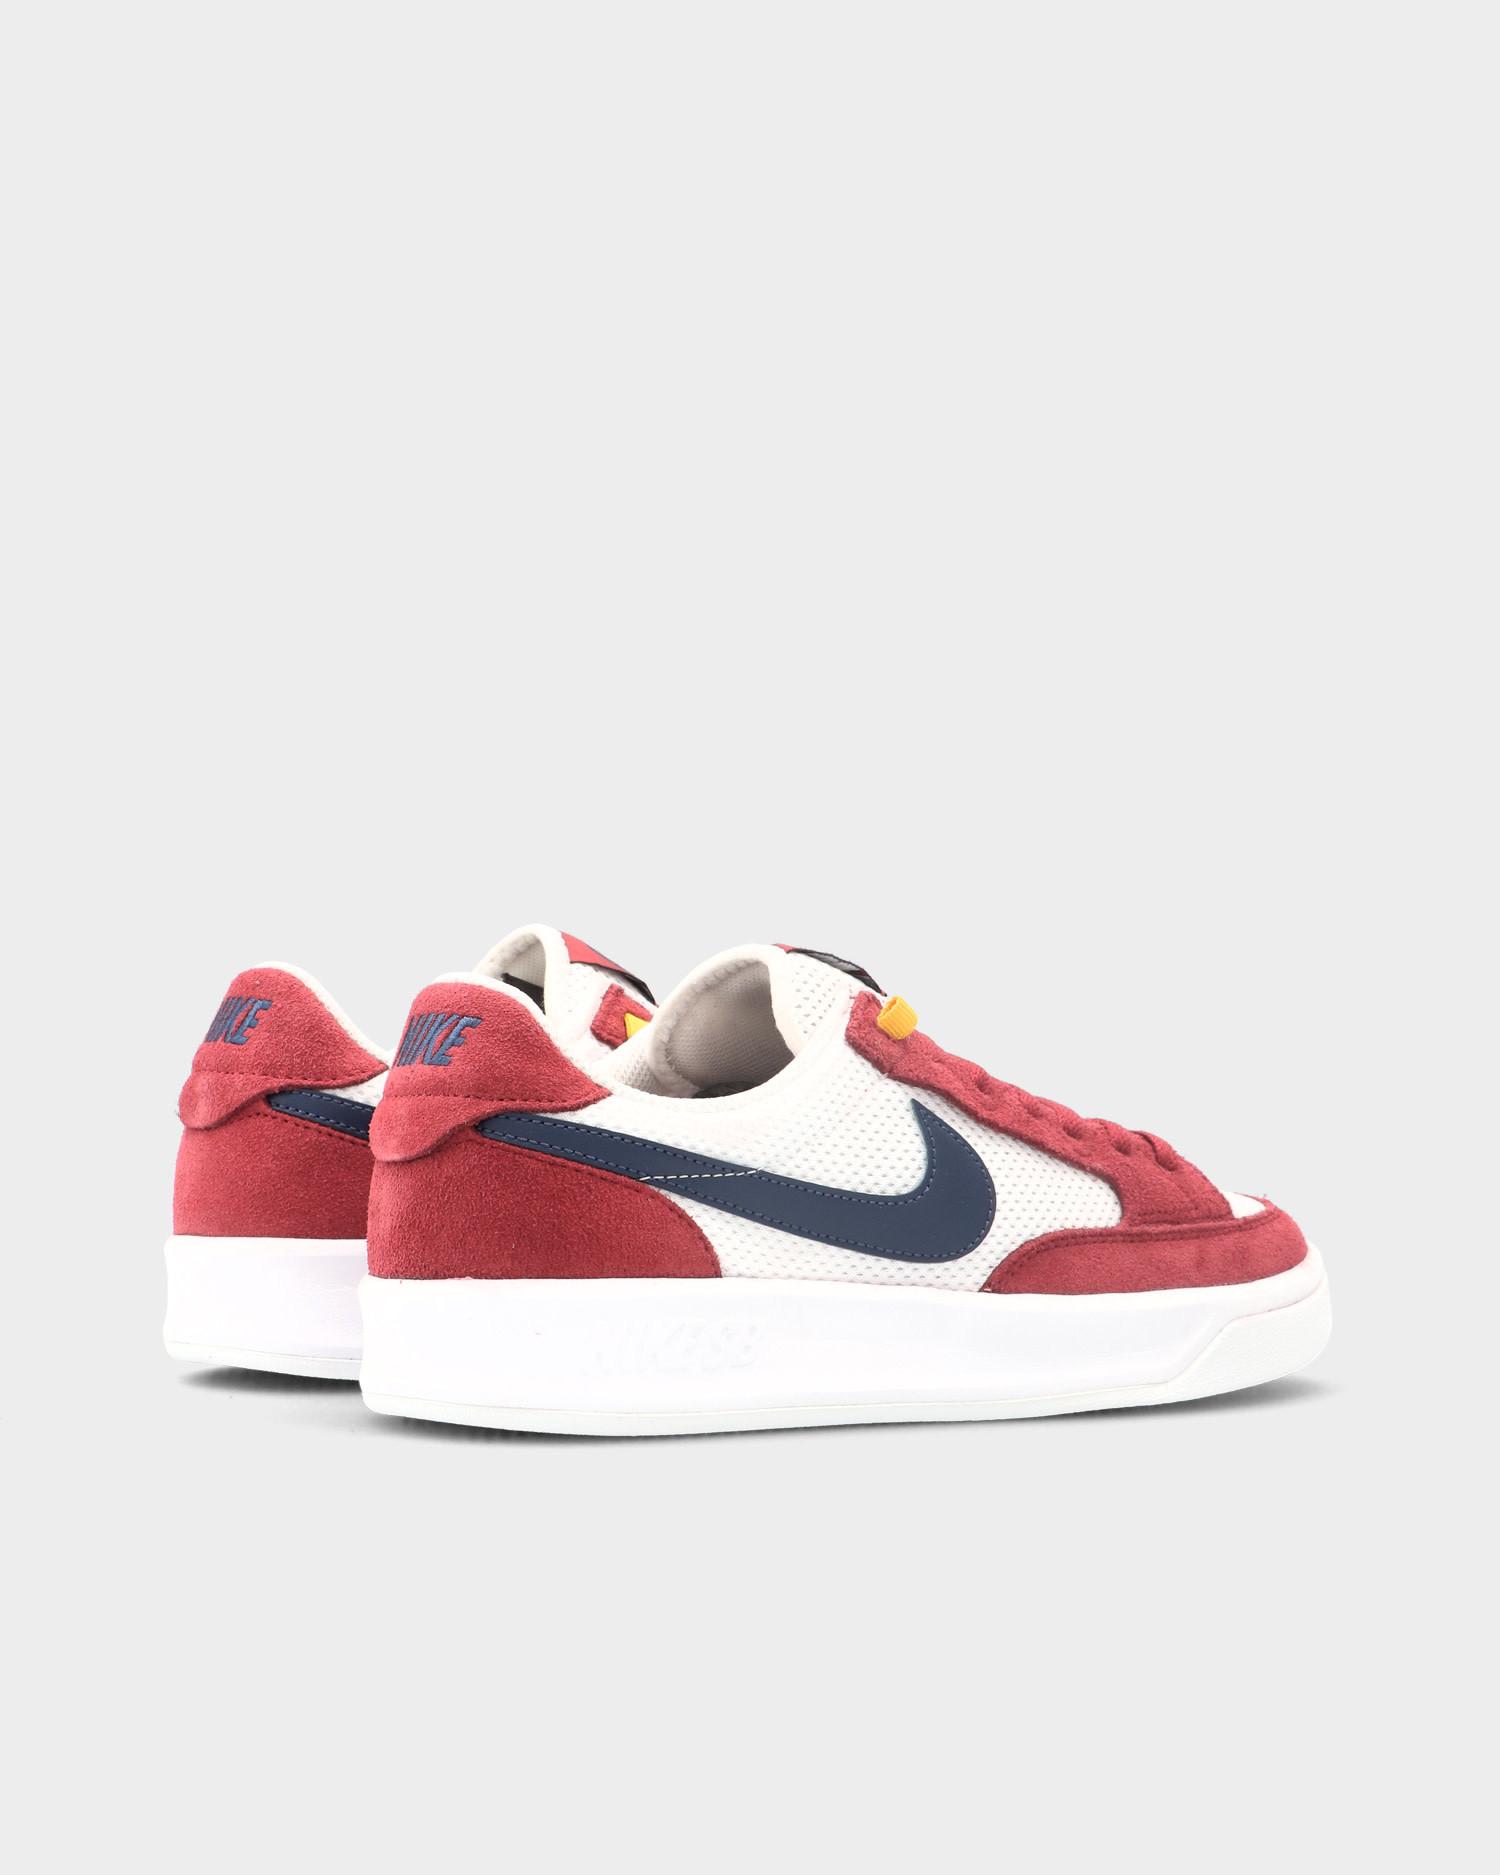 Nike SB Adversary Pomegranate/midnight navy-pollen-white